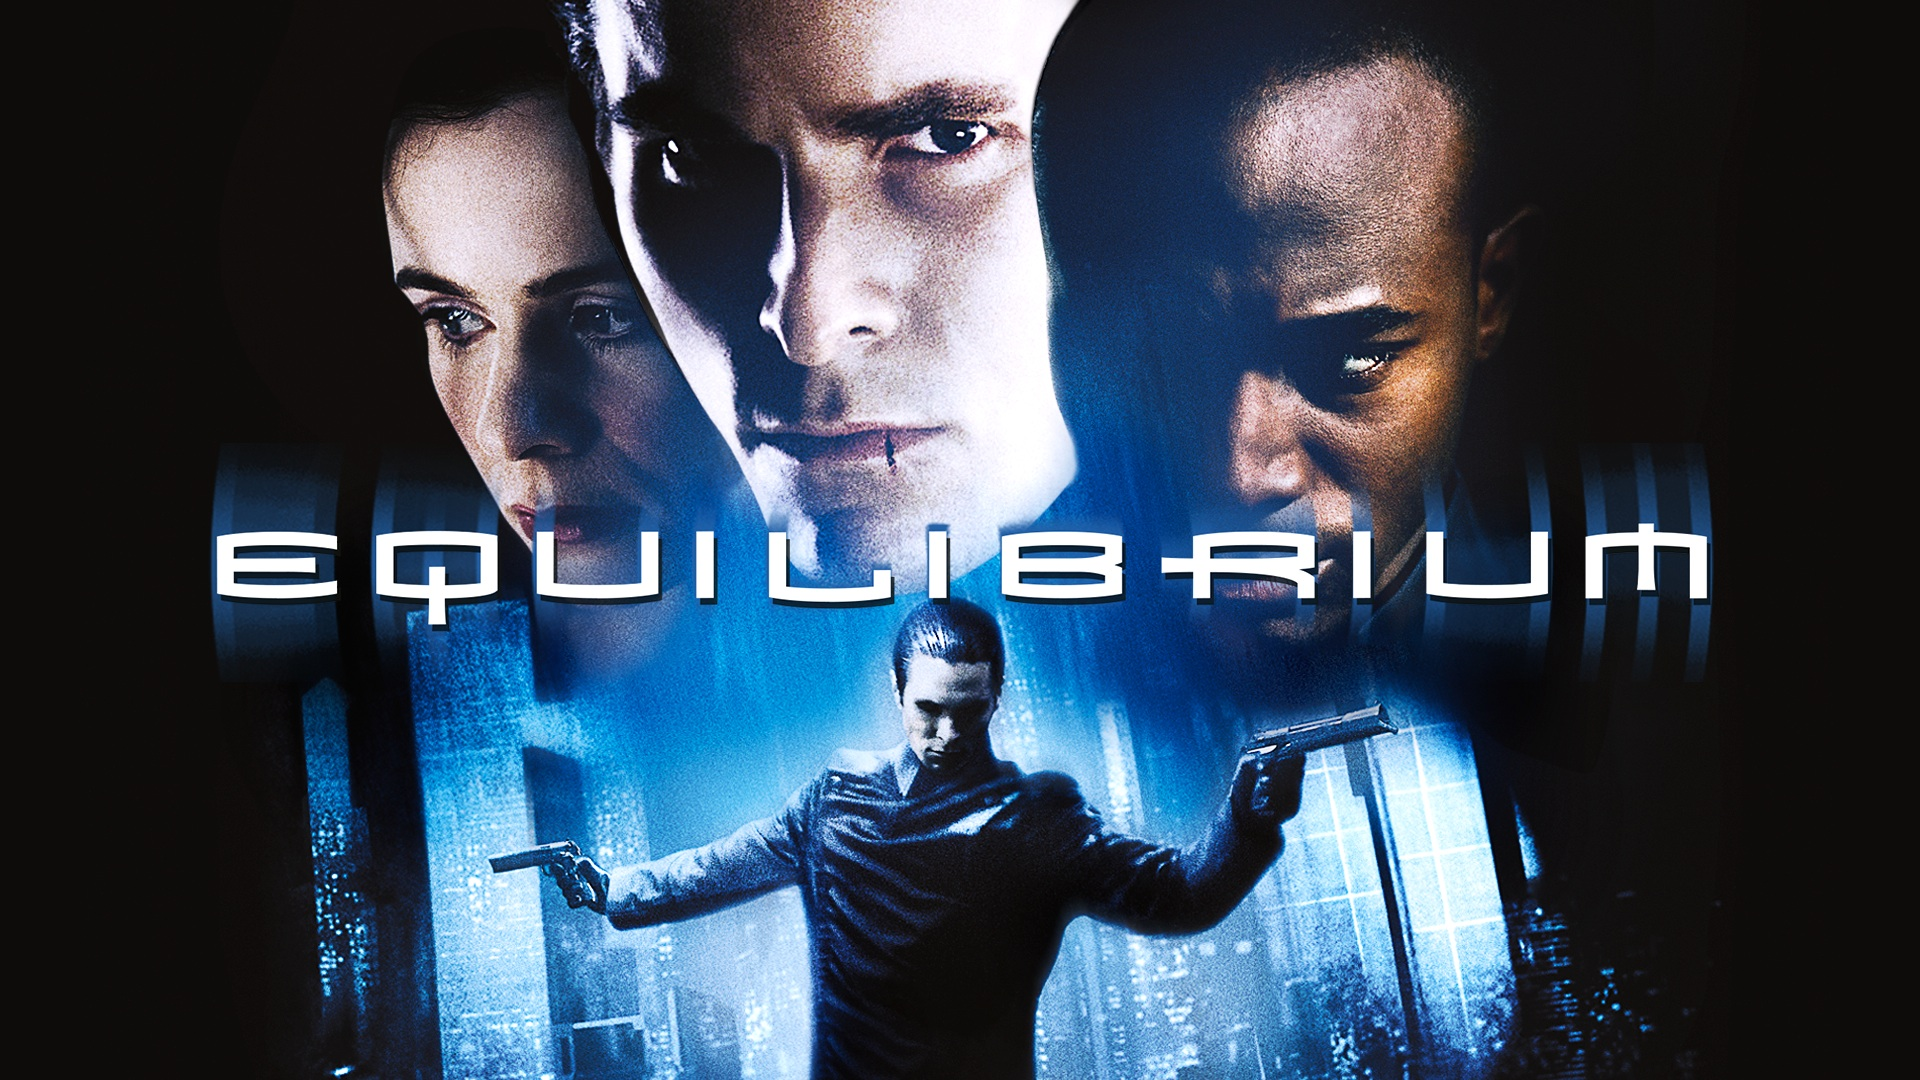 Equilibrium - Official Trailer (HD)